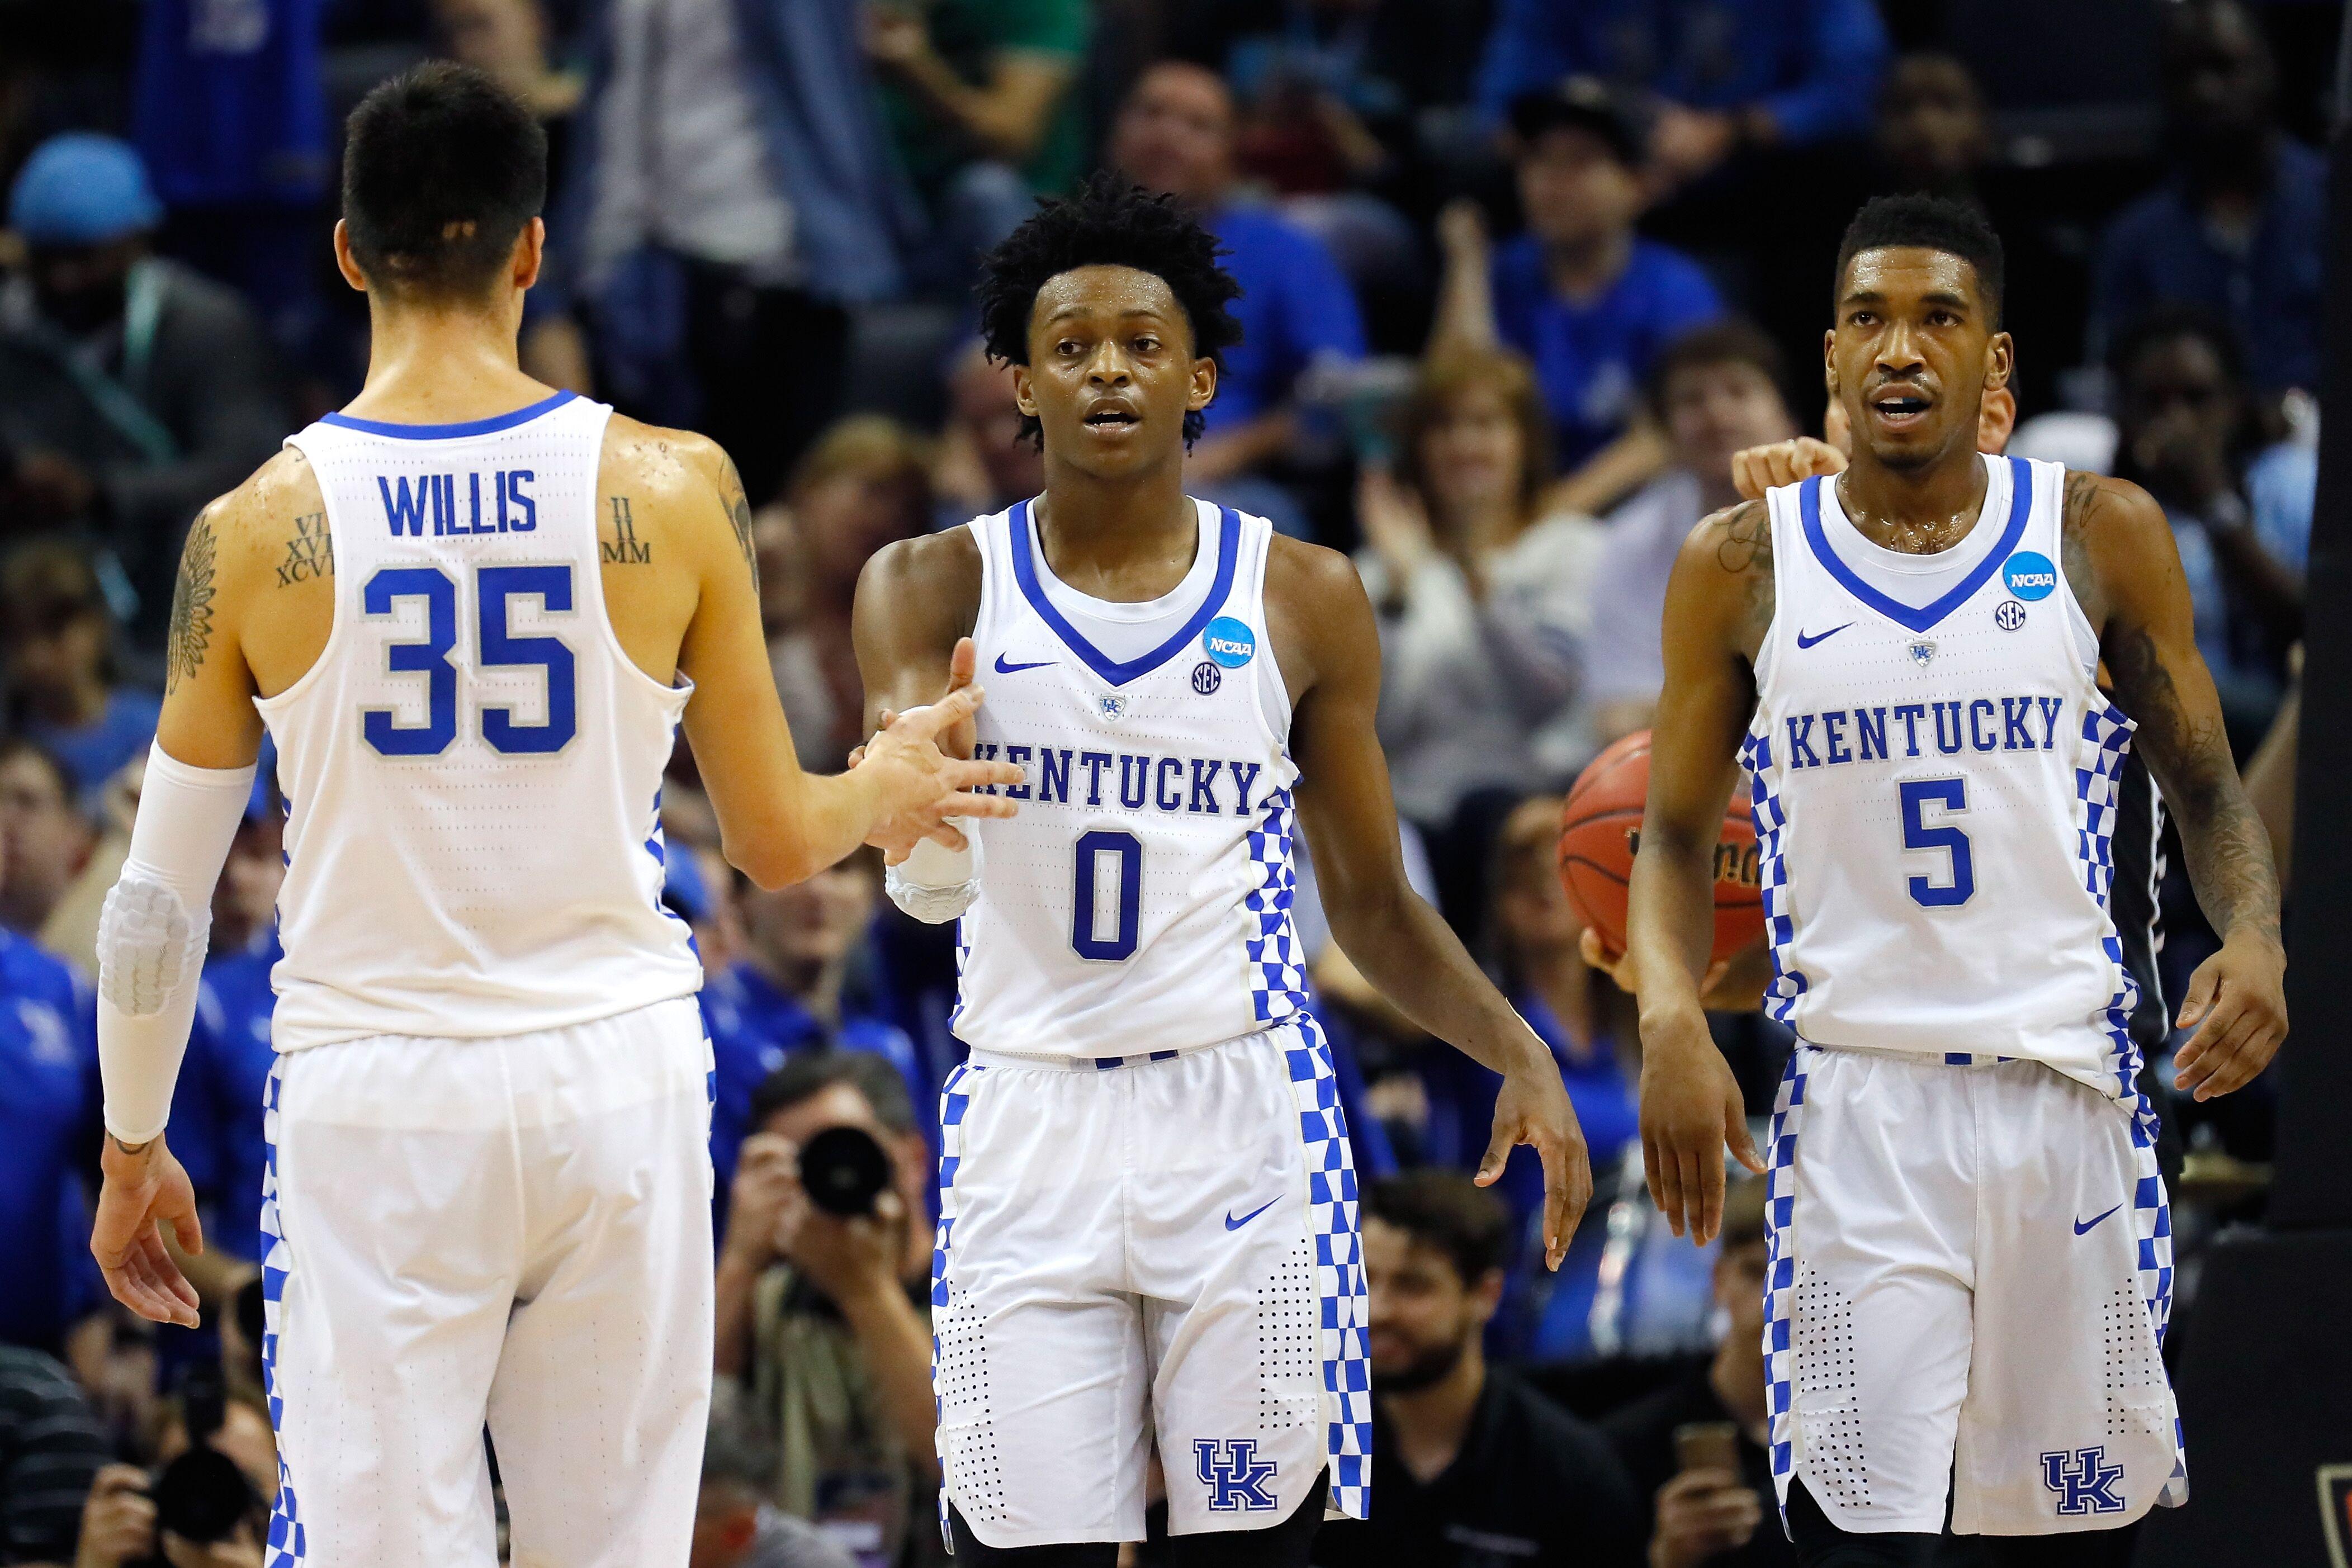 Uk Basketball: Kentucky Basketball: Former Wildcats To Put On Youth Camp